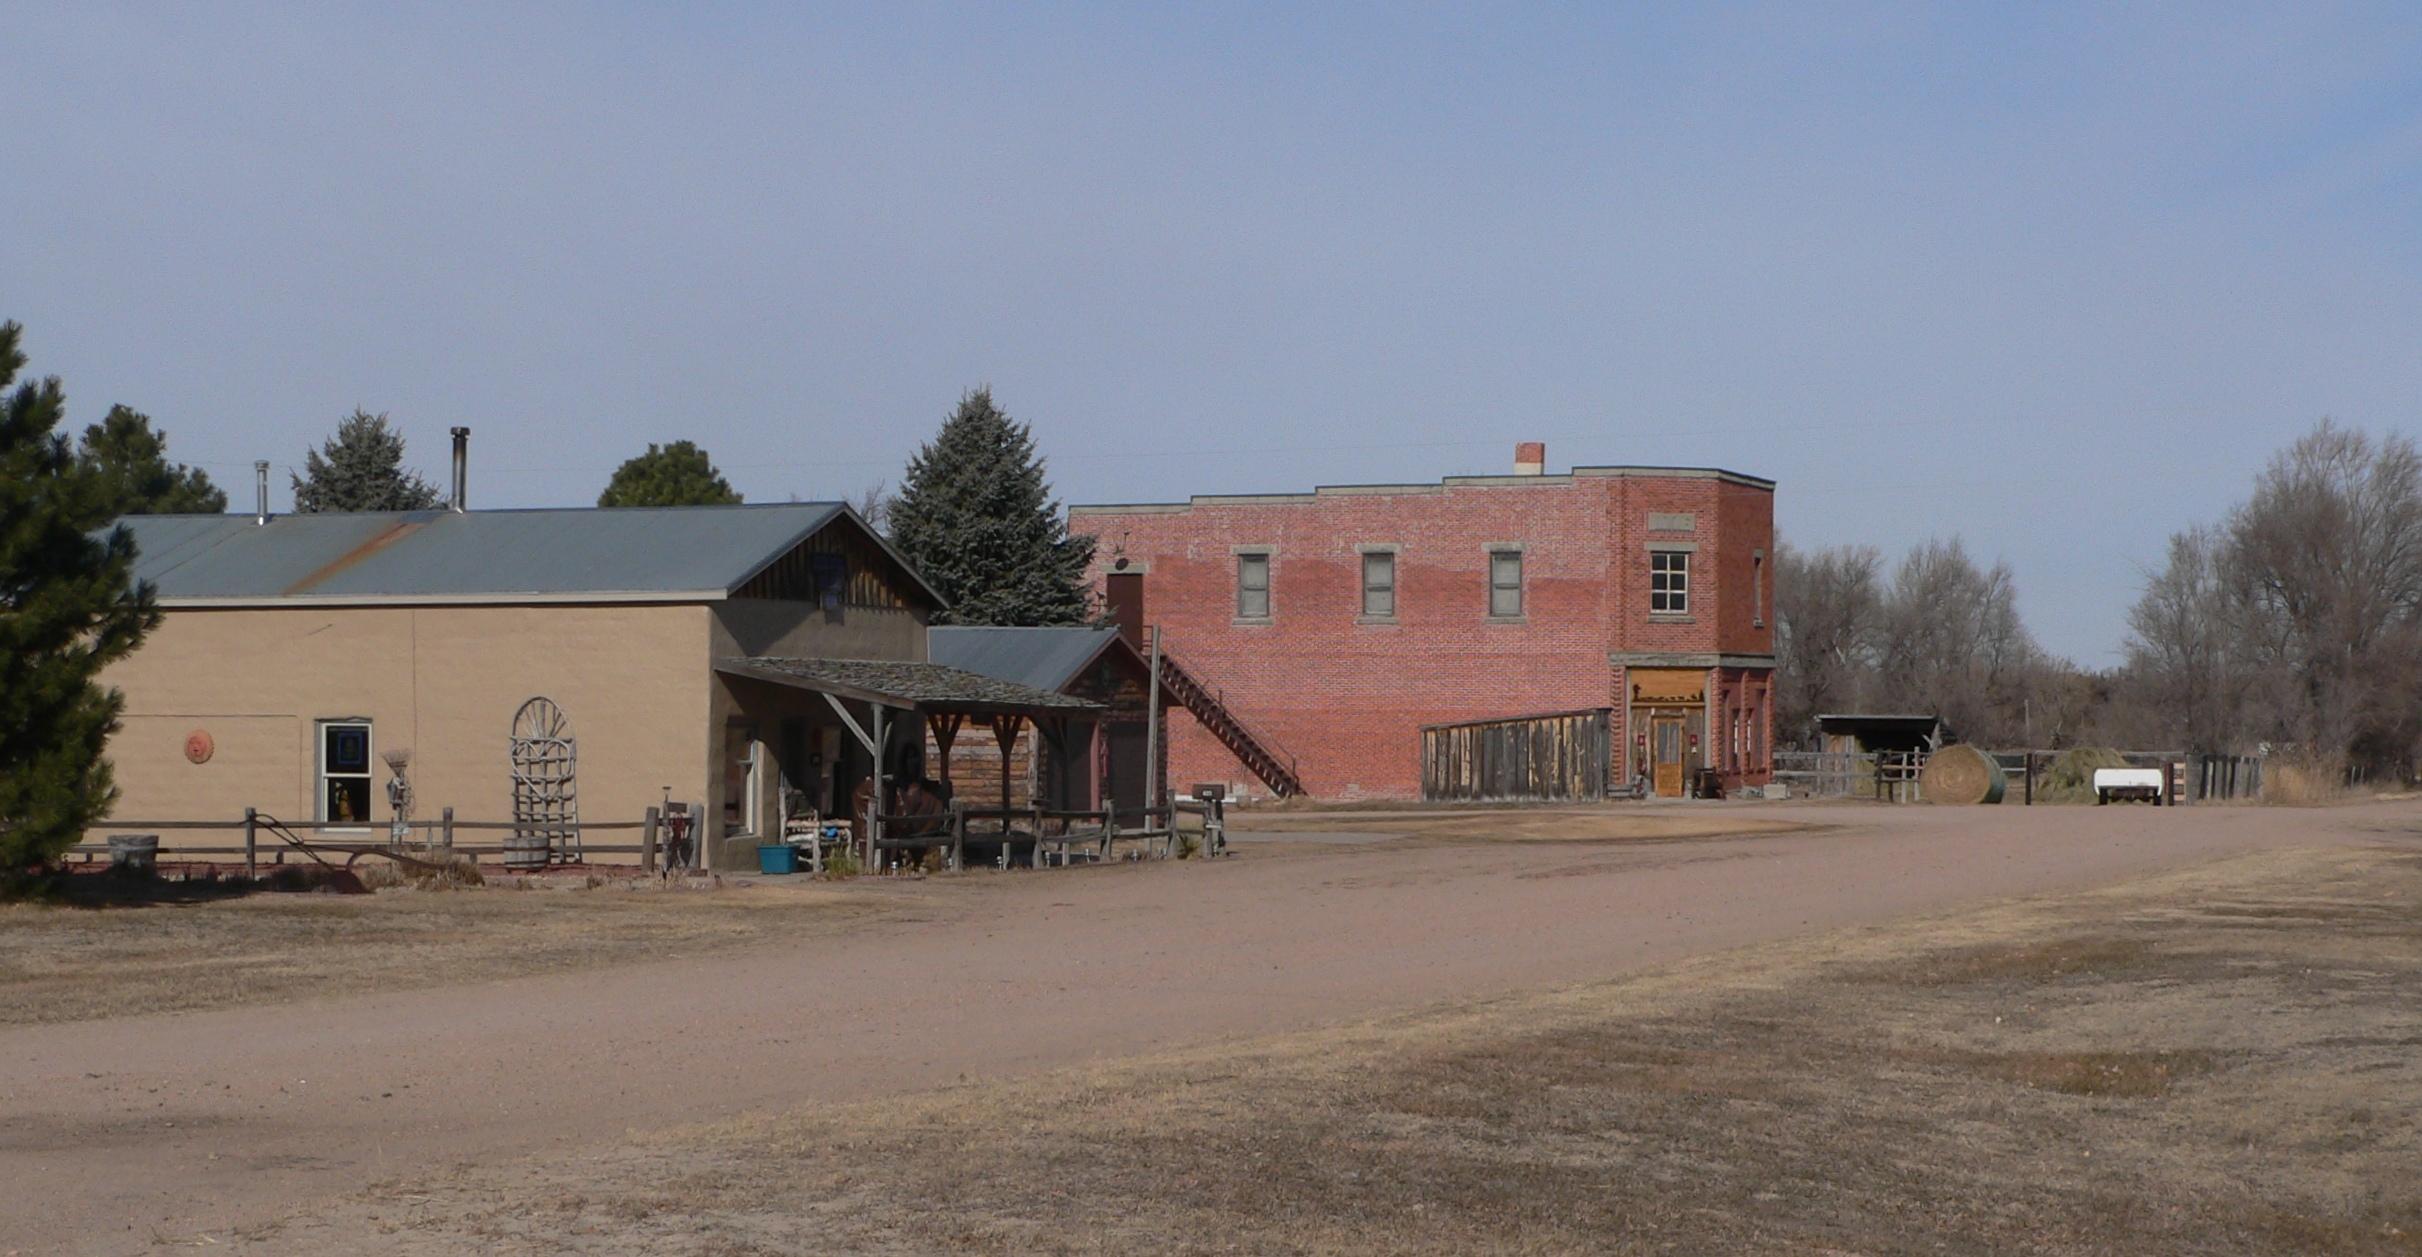 Singles in gandy nebraska Swingers in Gandy, Nebraska; adult swingers in lenwood california